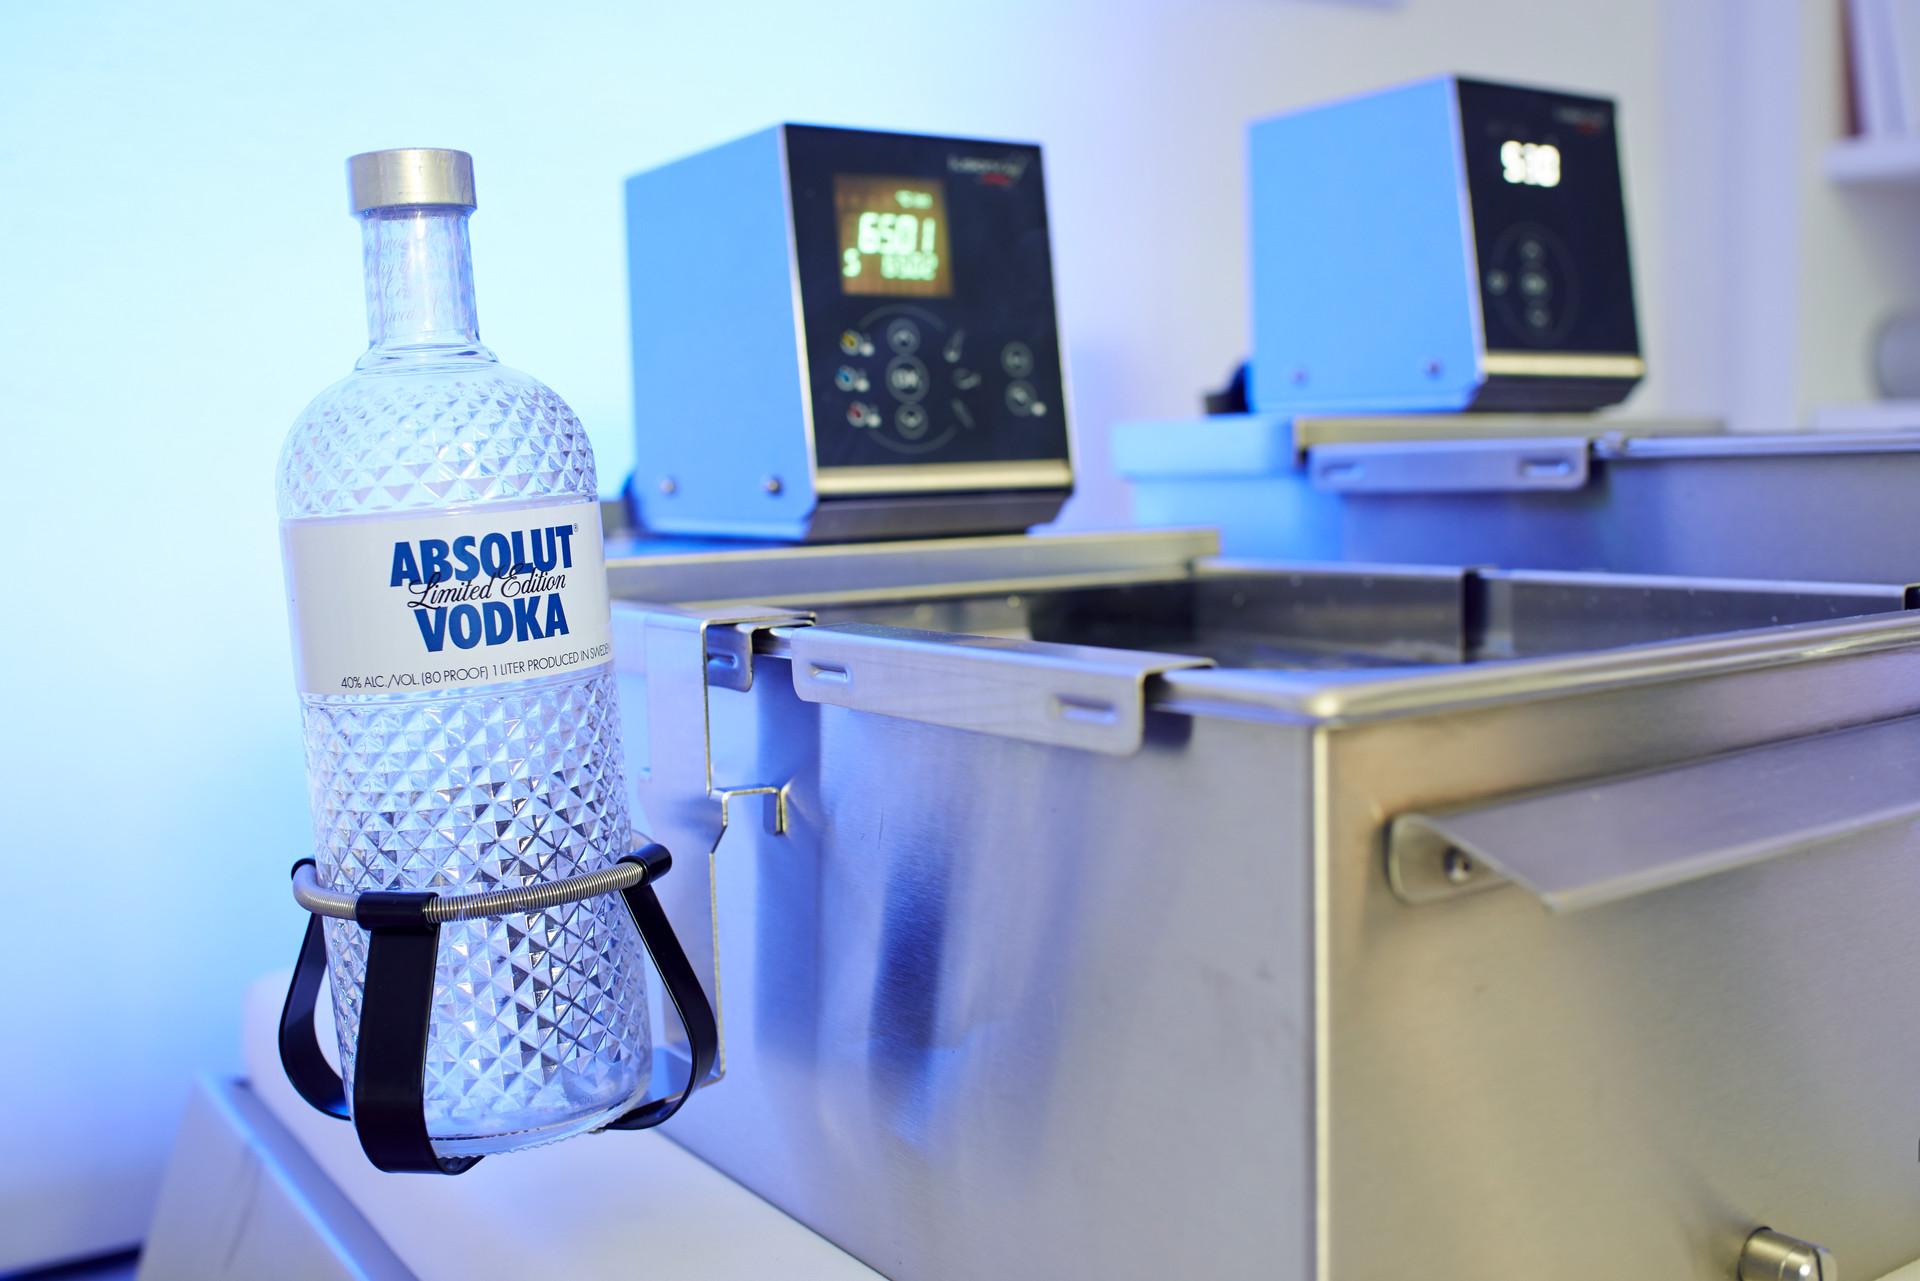 Absolut Vodka Event Eventfotografie Portrait Dokumentation Party Fotografie Foto Fotograf Auftragsfotograf Philipp Löffler Loeffler - München